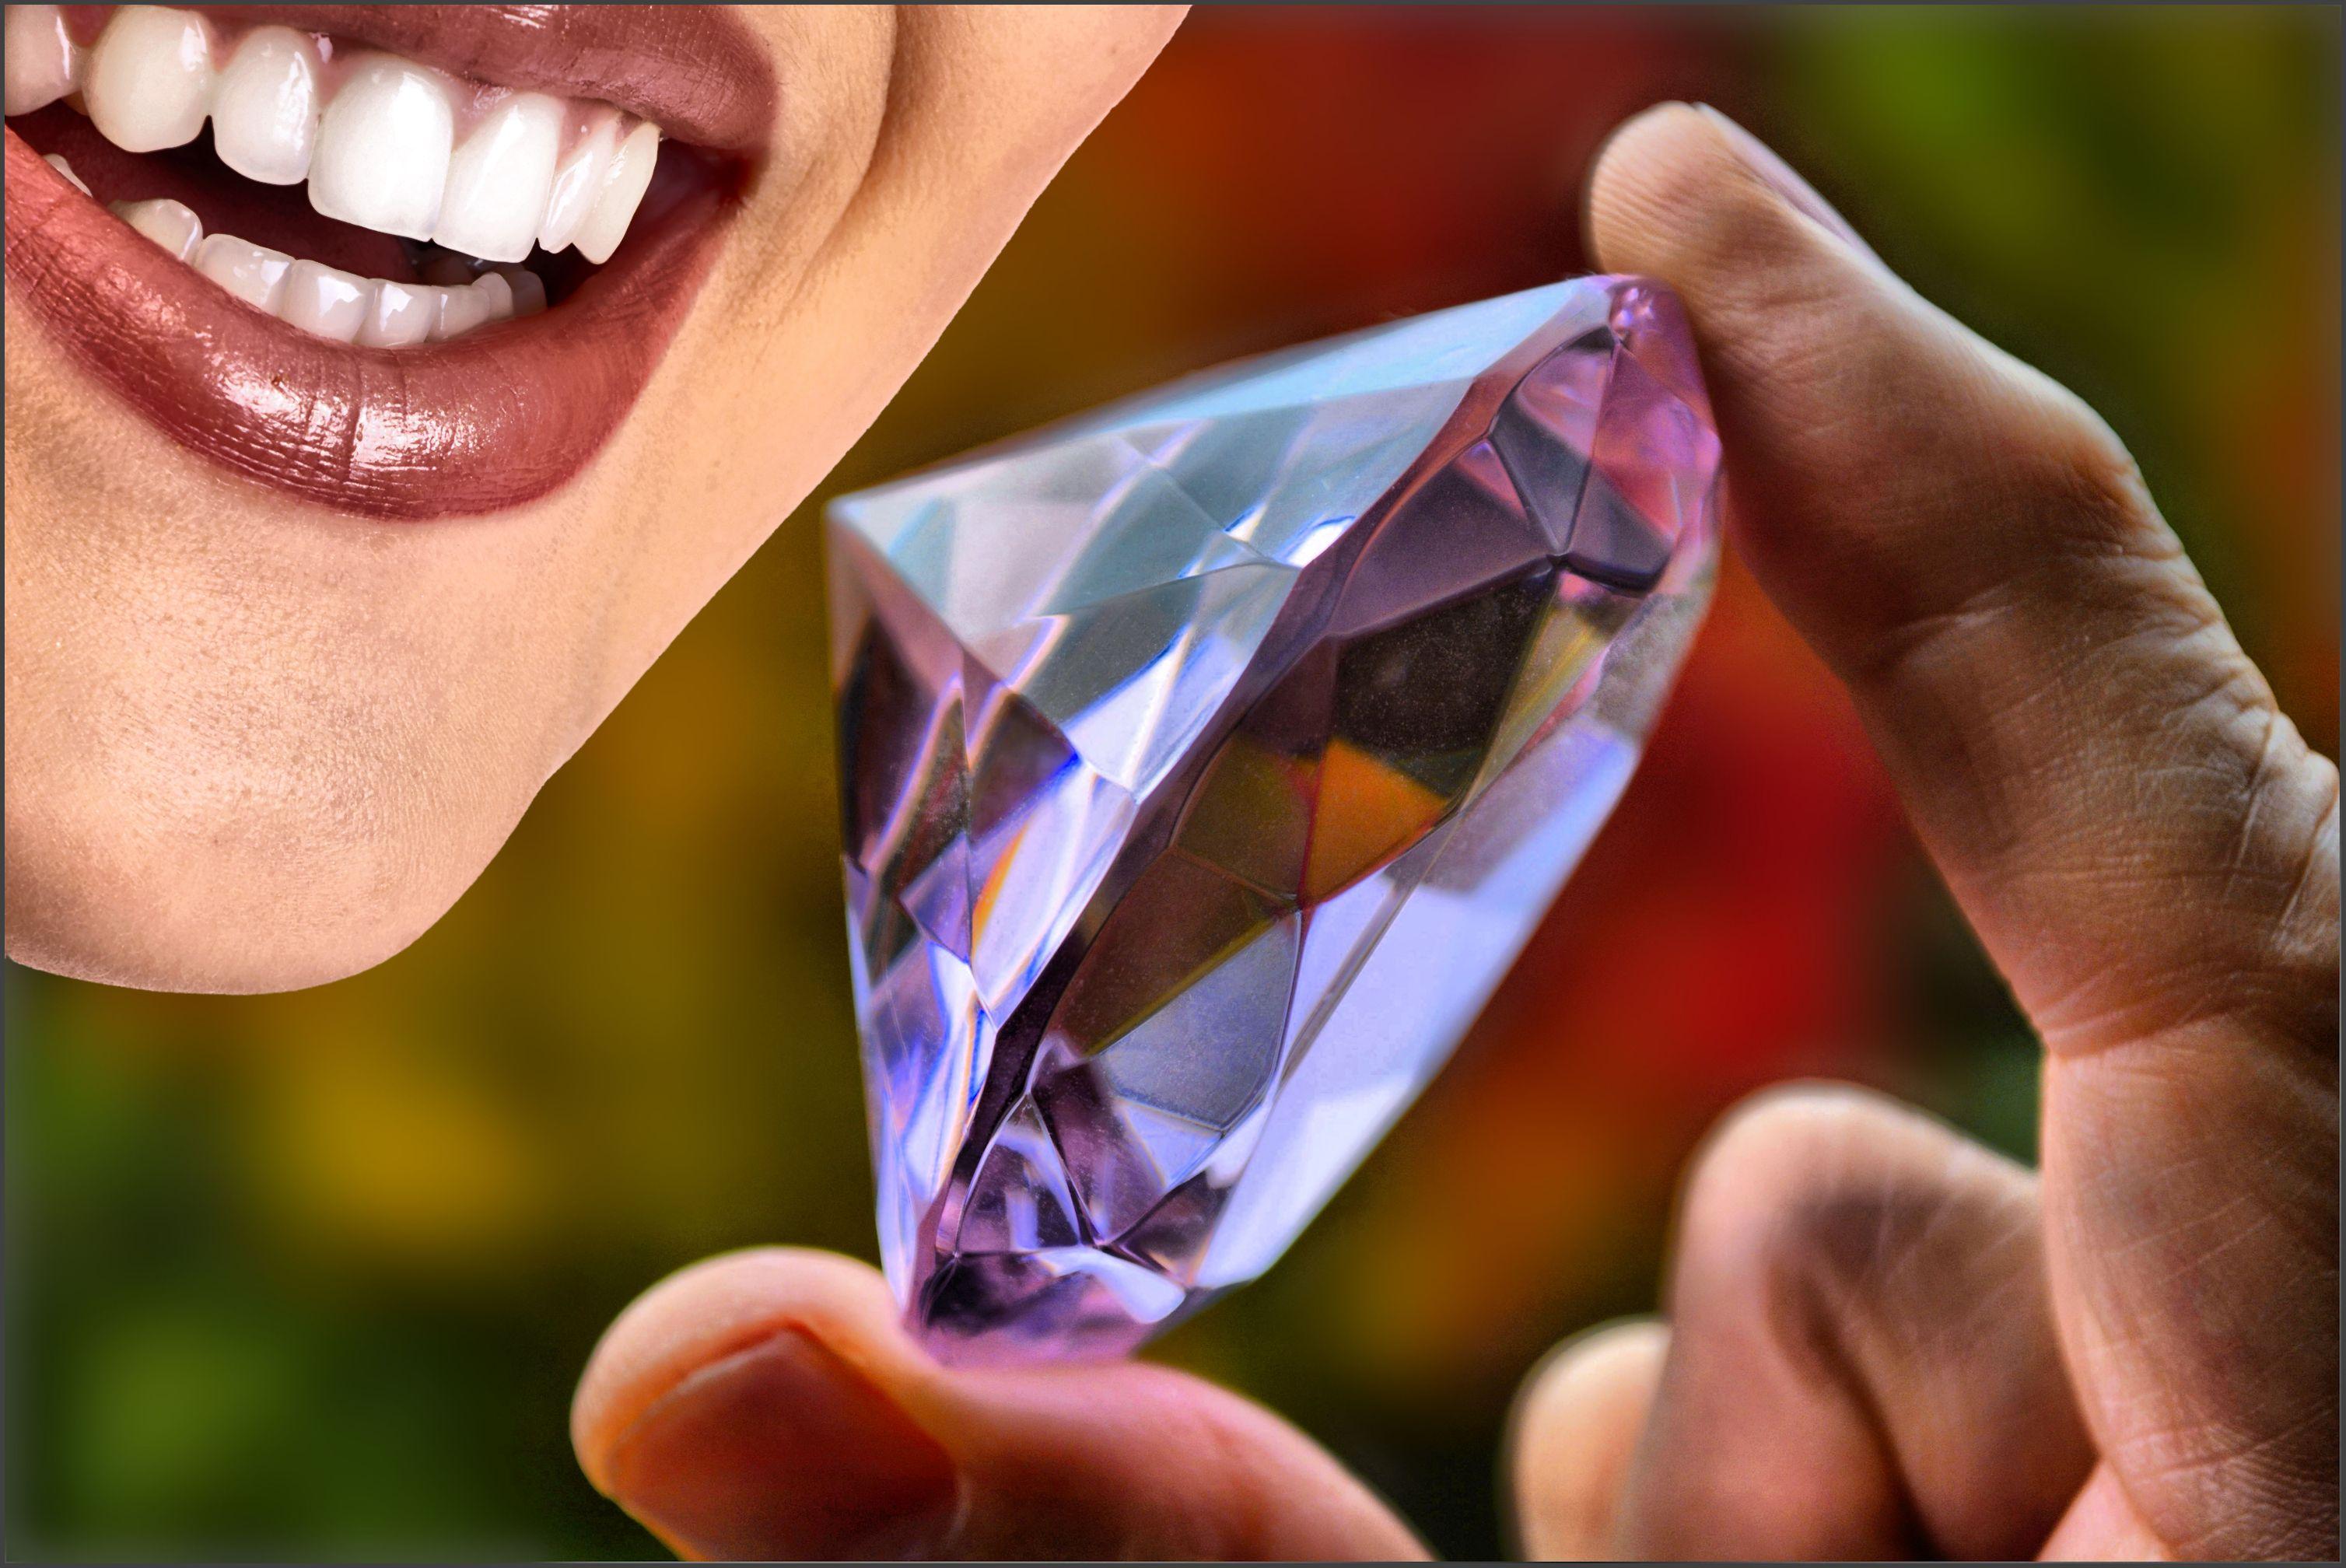 Wallpaper Lips Teeth Mouth Bokeh Happy Hand Nail Female